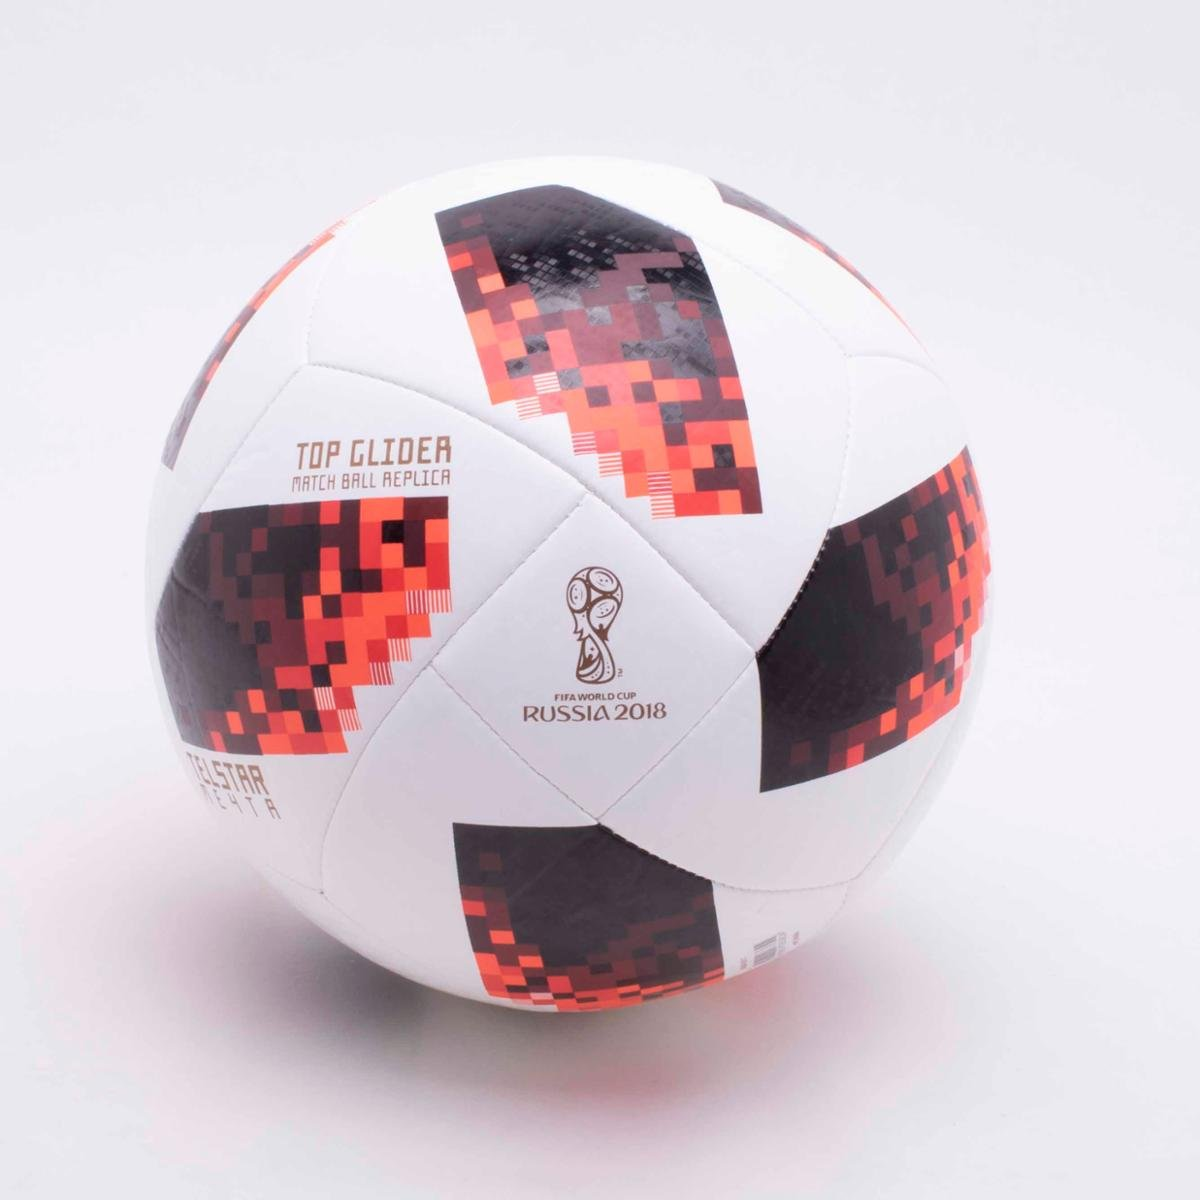 ... Bola de Futebol Campo Adidas Telstar 18 Top Glider Réplica Mata-Mata Copa  do Mundo 2c58bb980ec7f